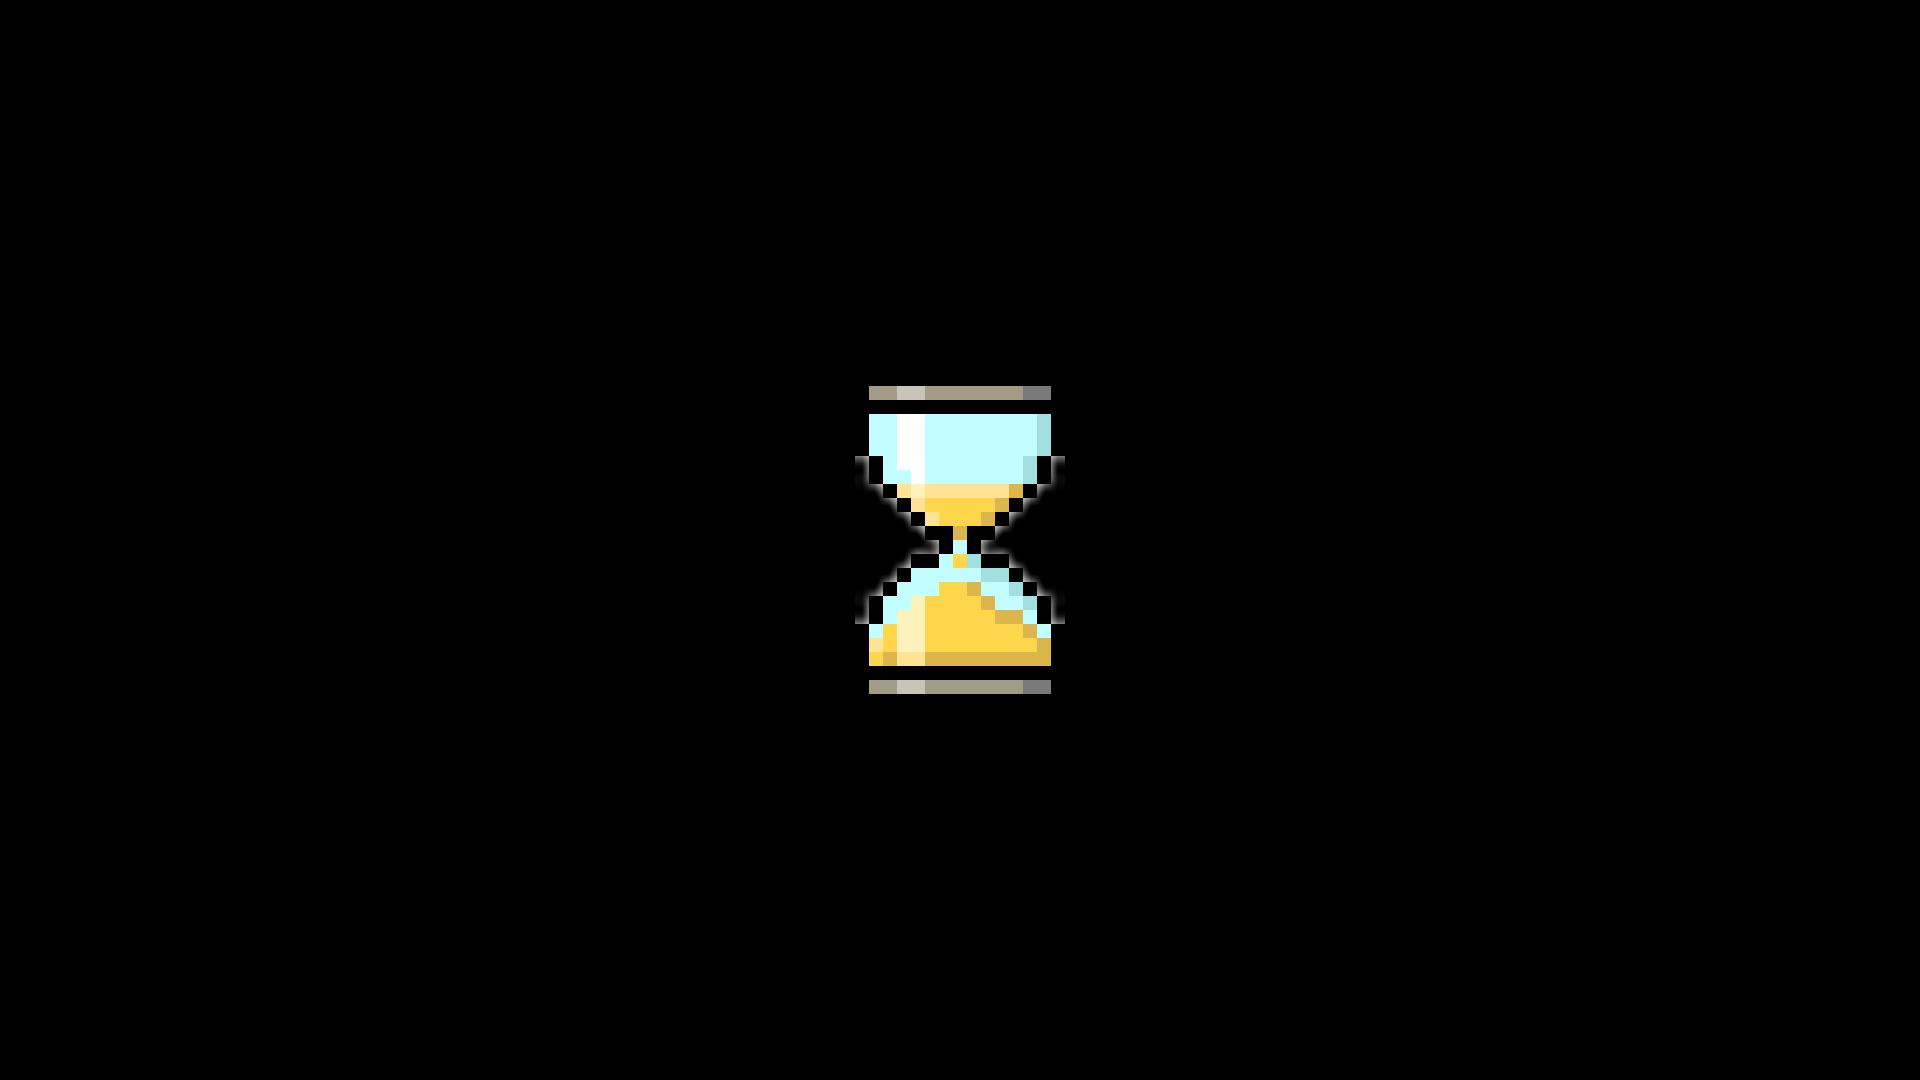 General 1920x1080 pixel art pixels time hourglasses minimalism